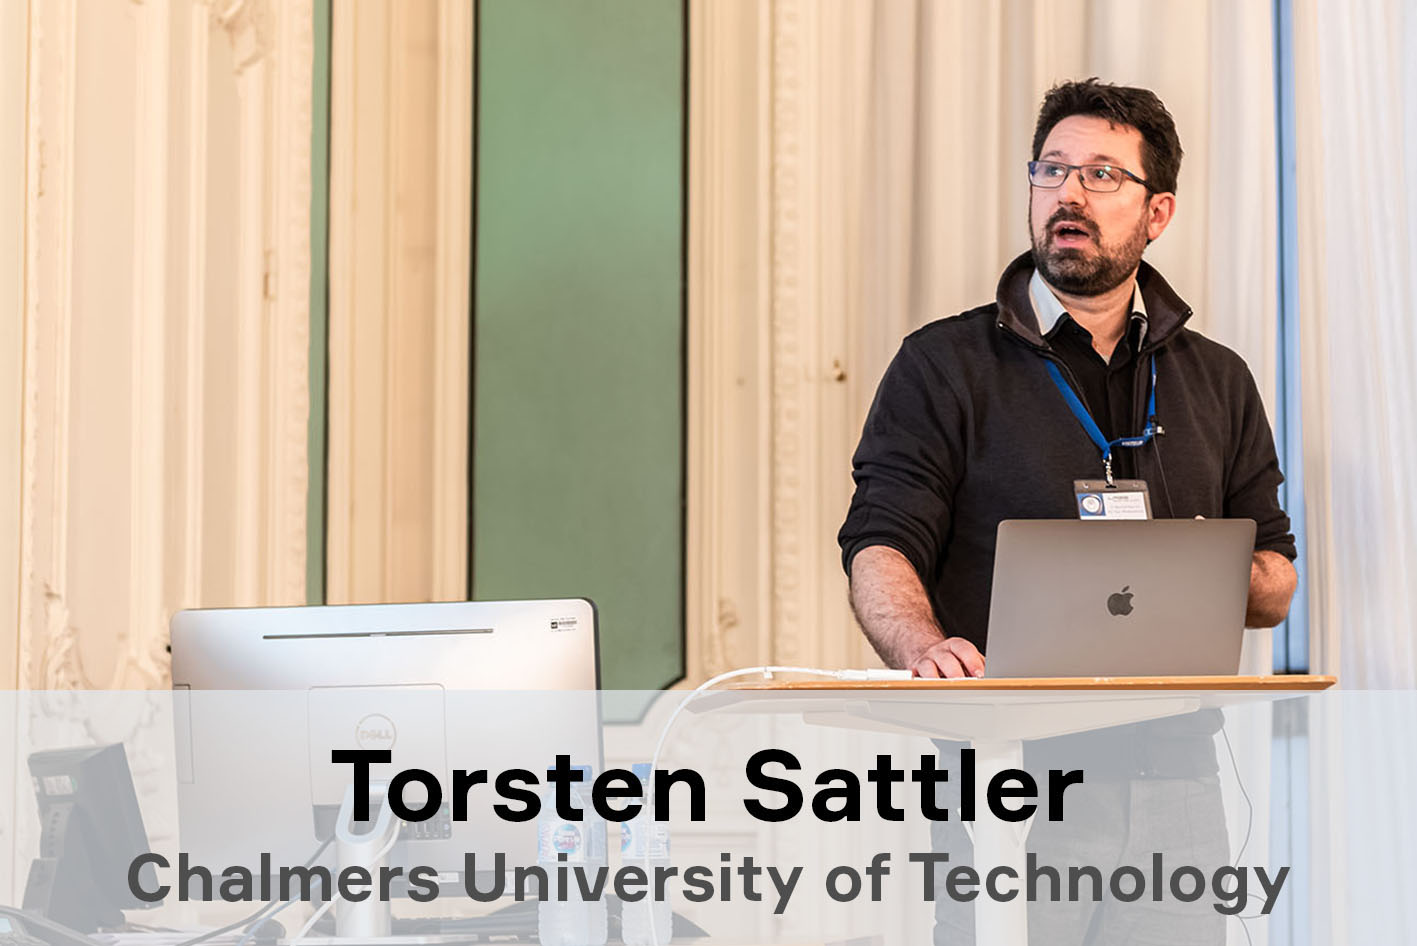 Torsten Sattler